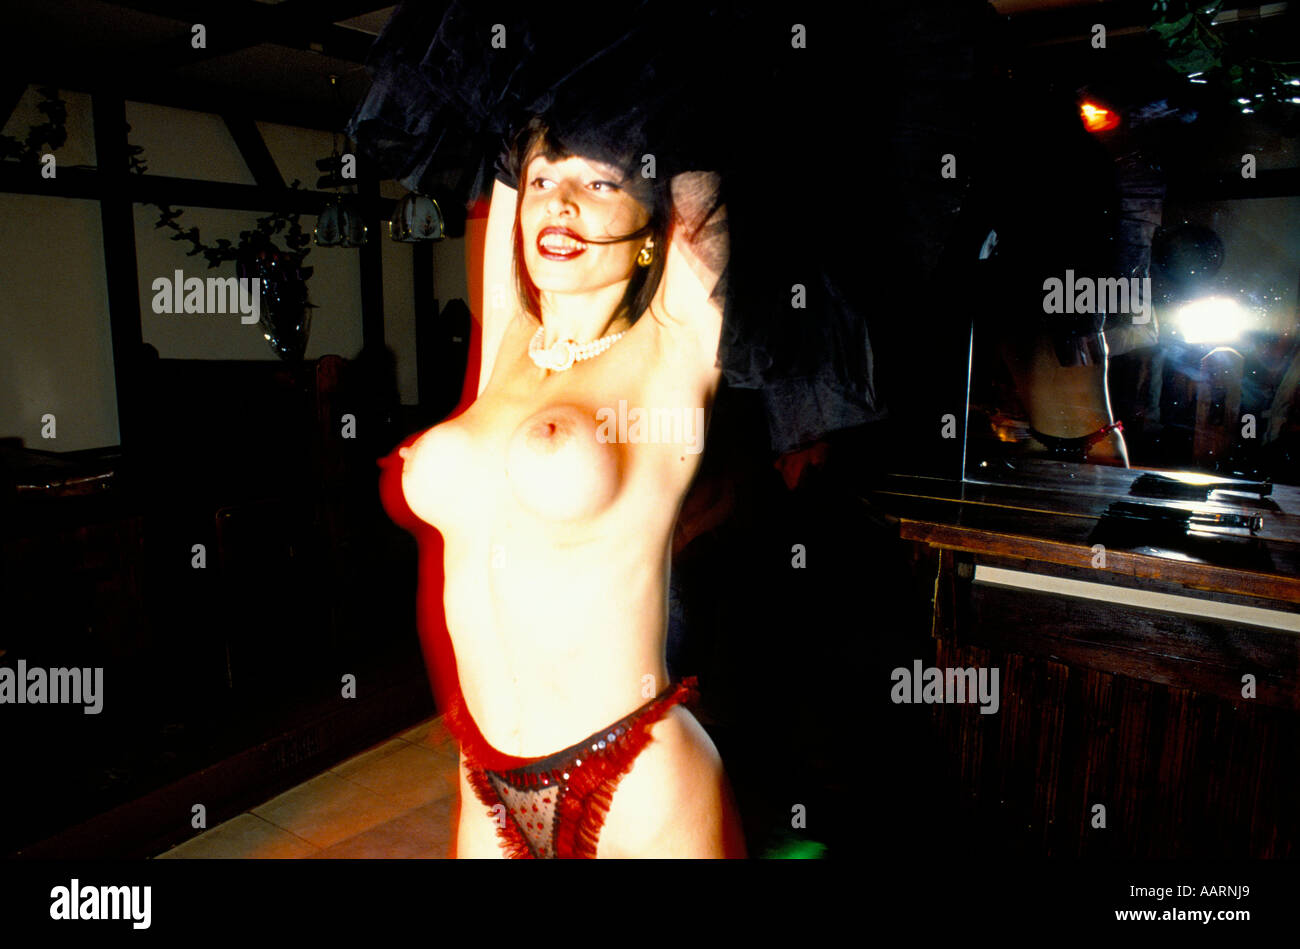 Quite good Strip club strippers happens. Let's